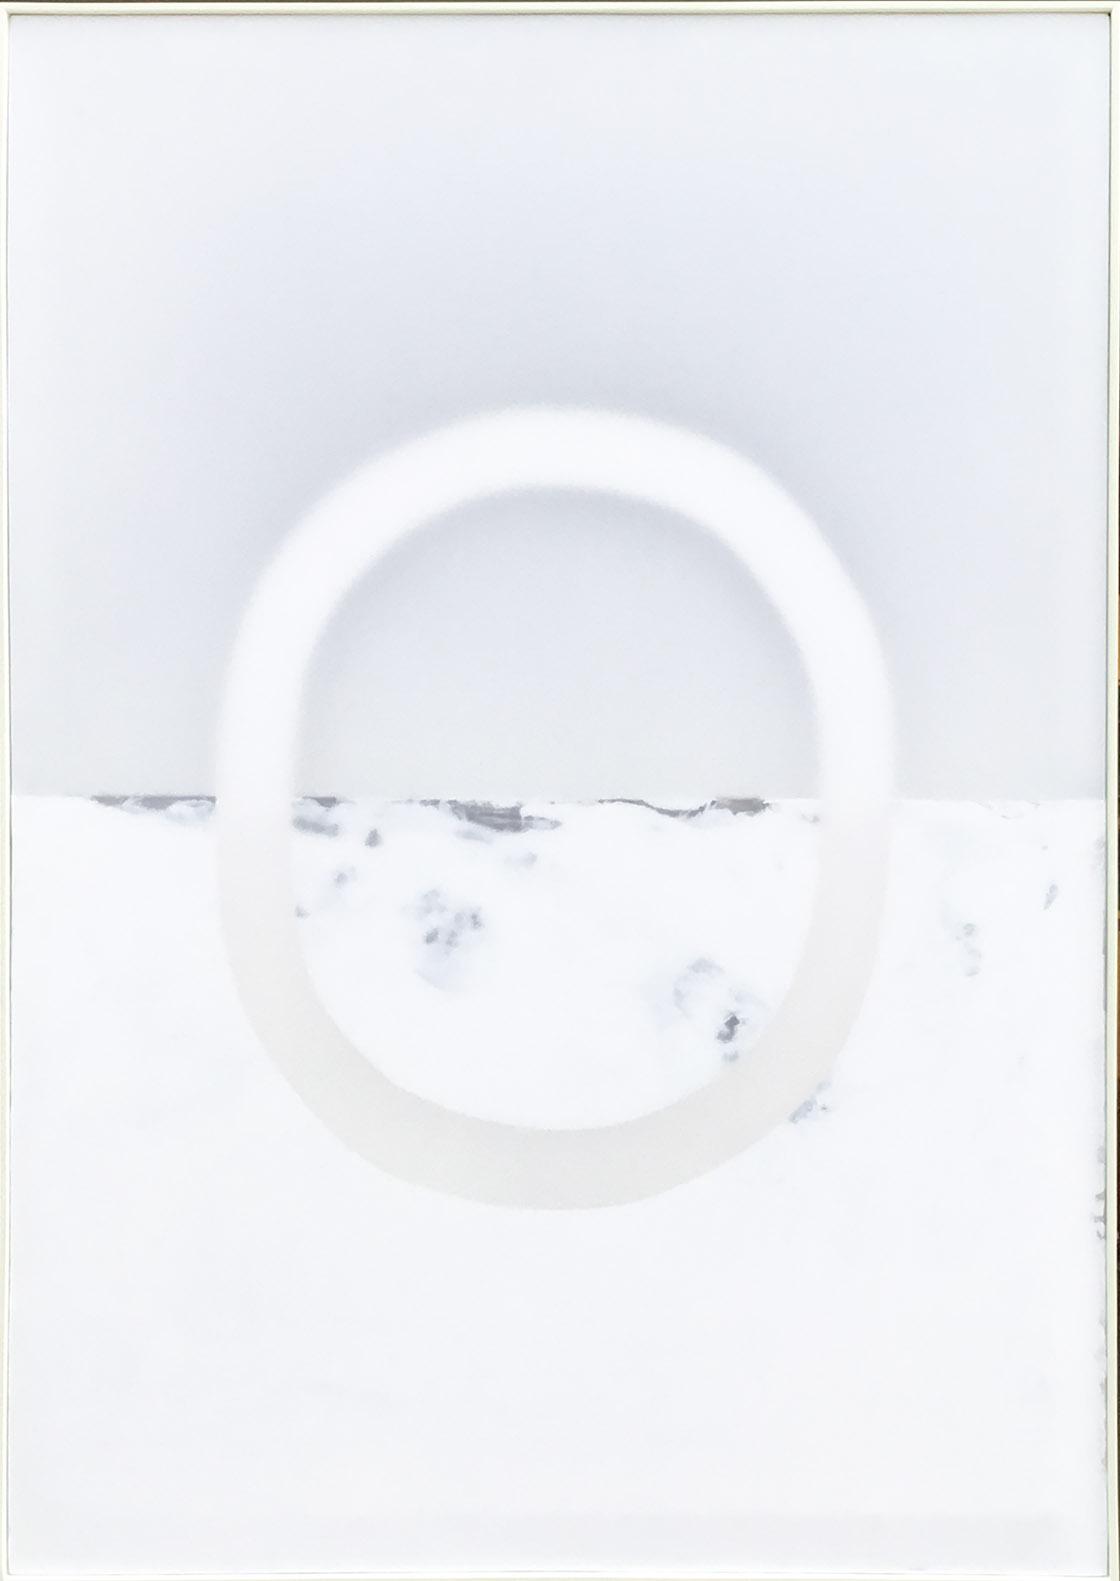 'Innere Zeit 7' - Udo Nöger at Kostuik Gallery